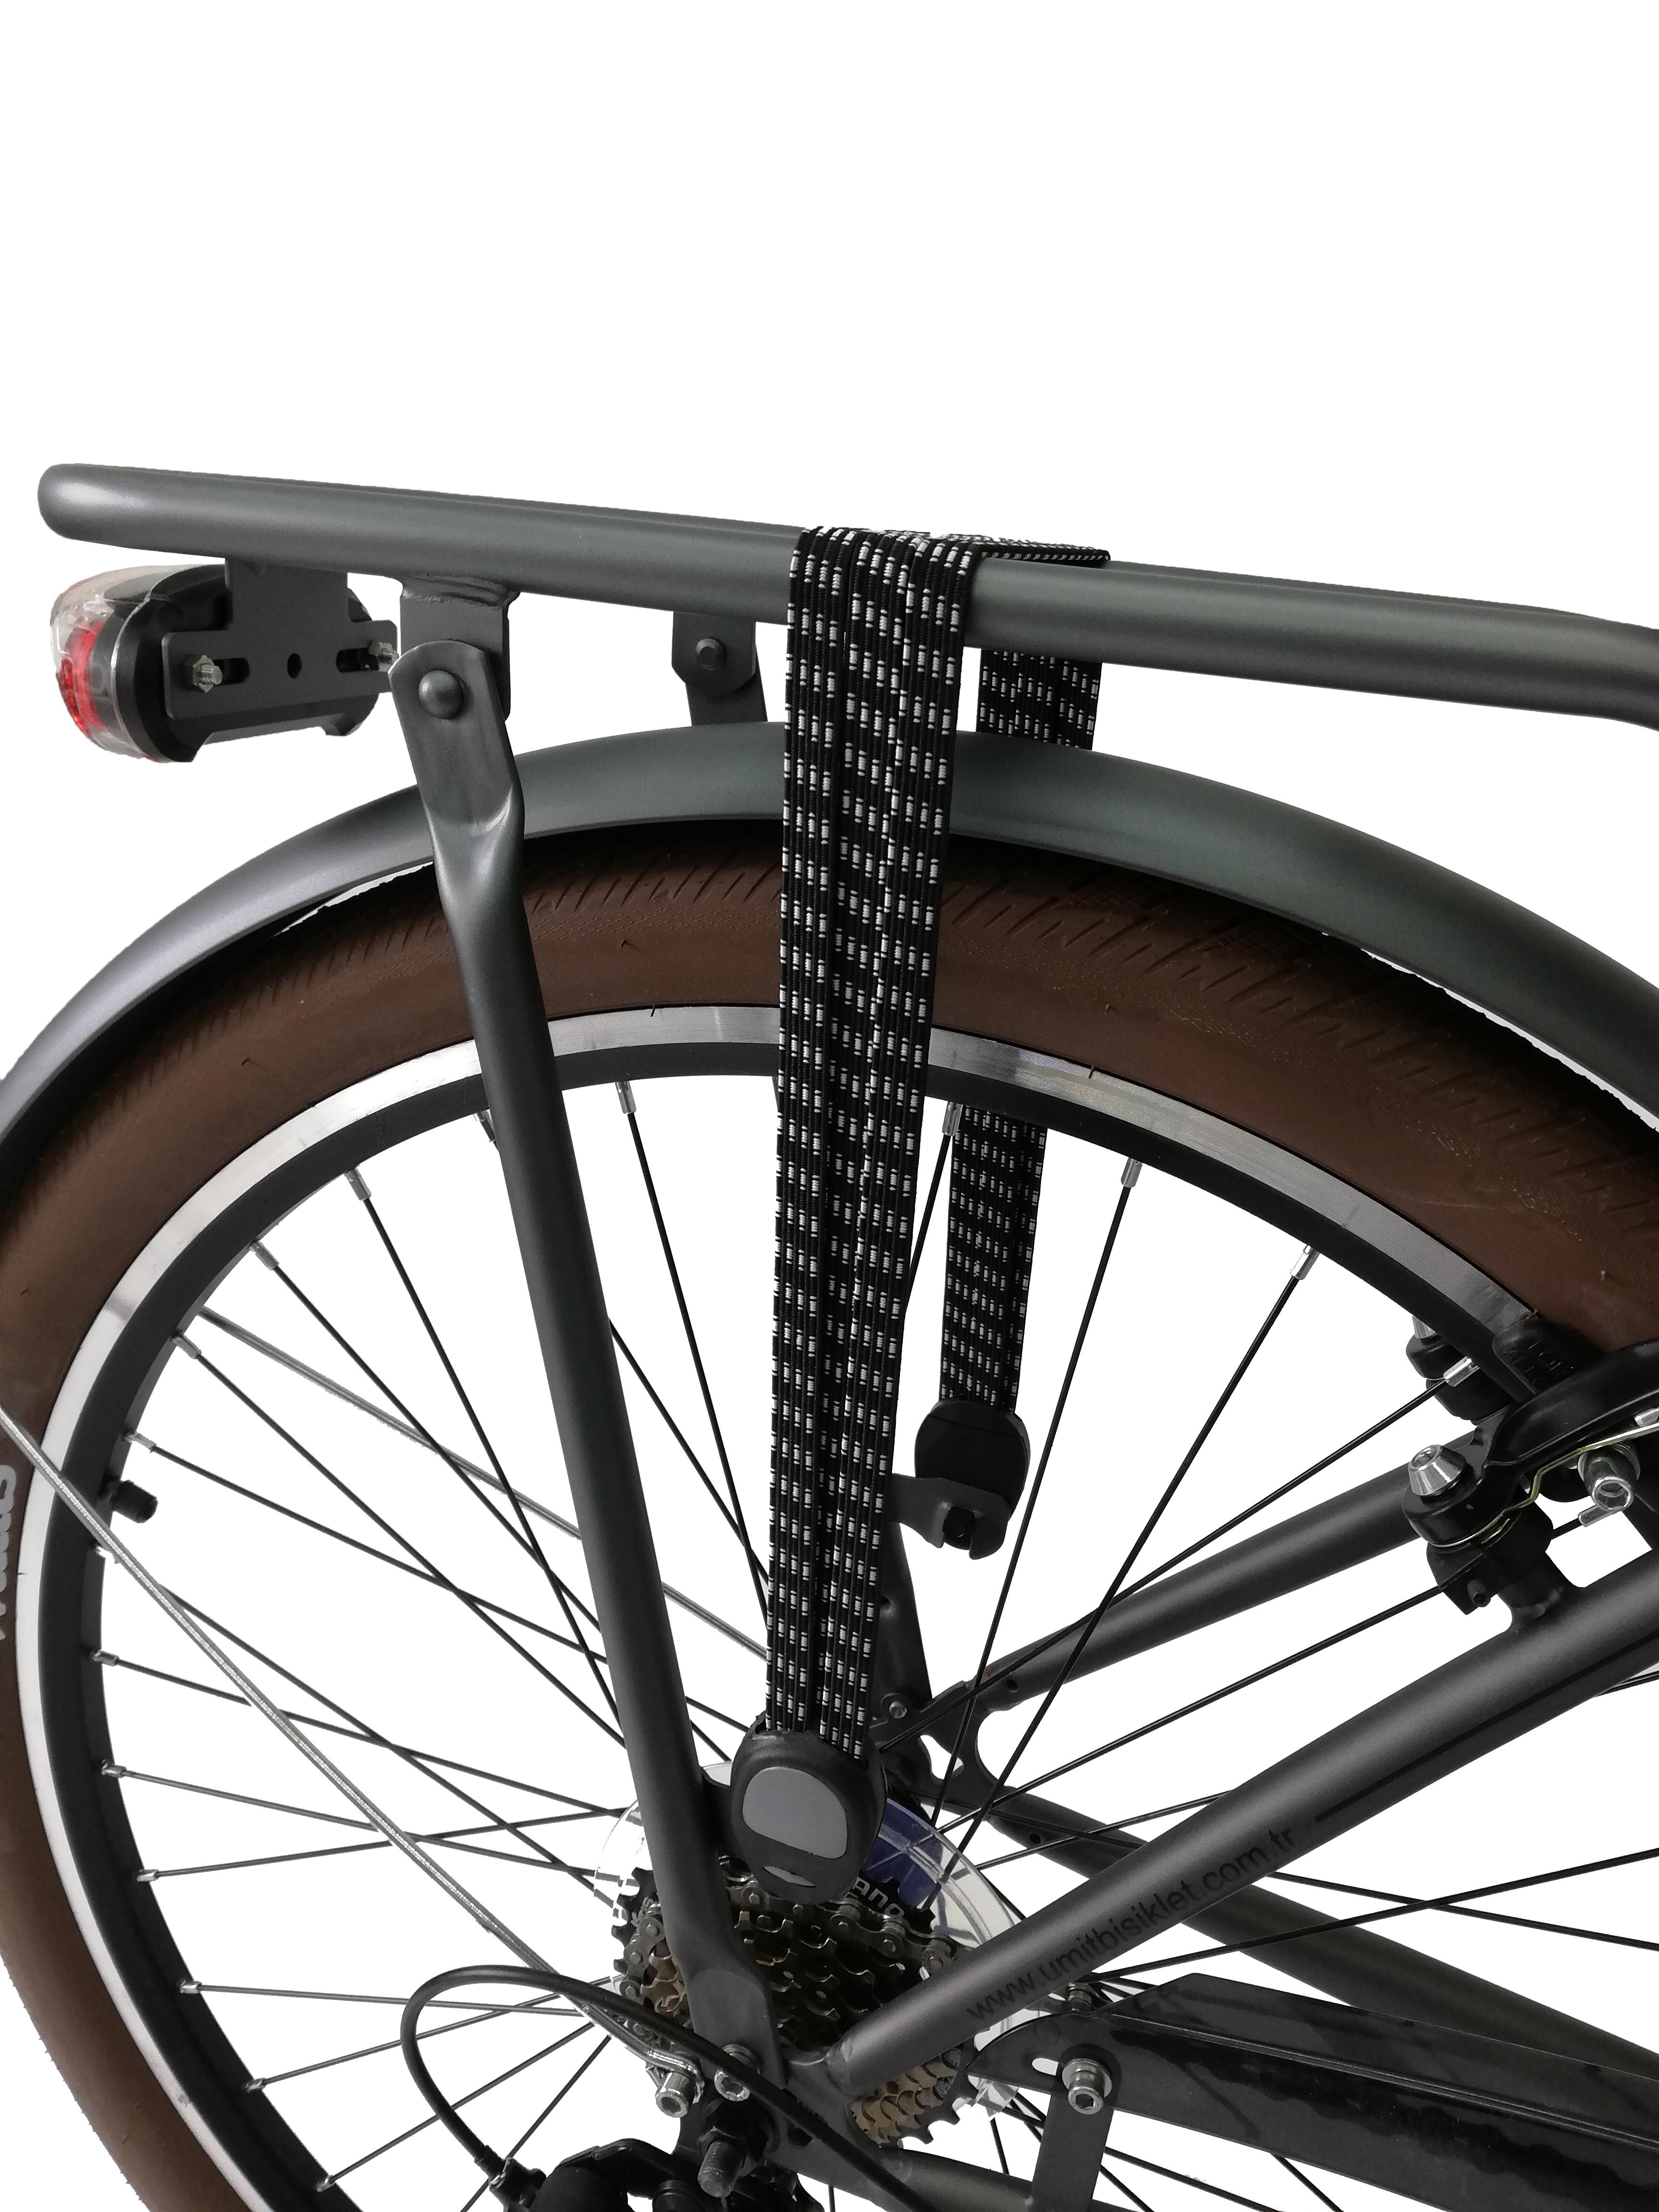 "Bicicleta City Umit Wagen Lady, Culoare Gri, Roata 26"" Otel [4]"